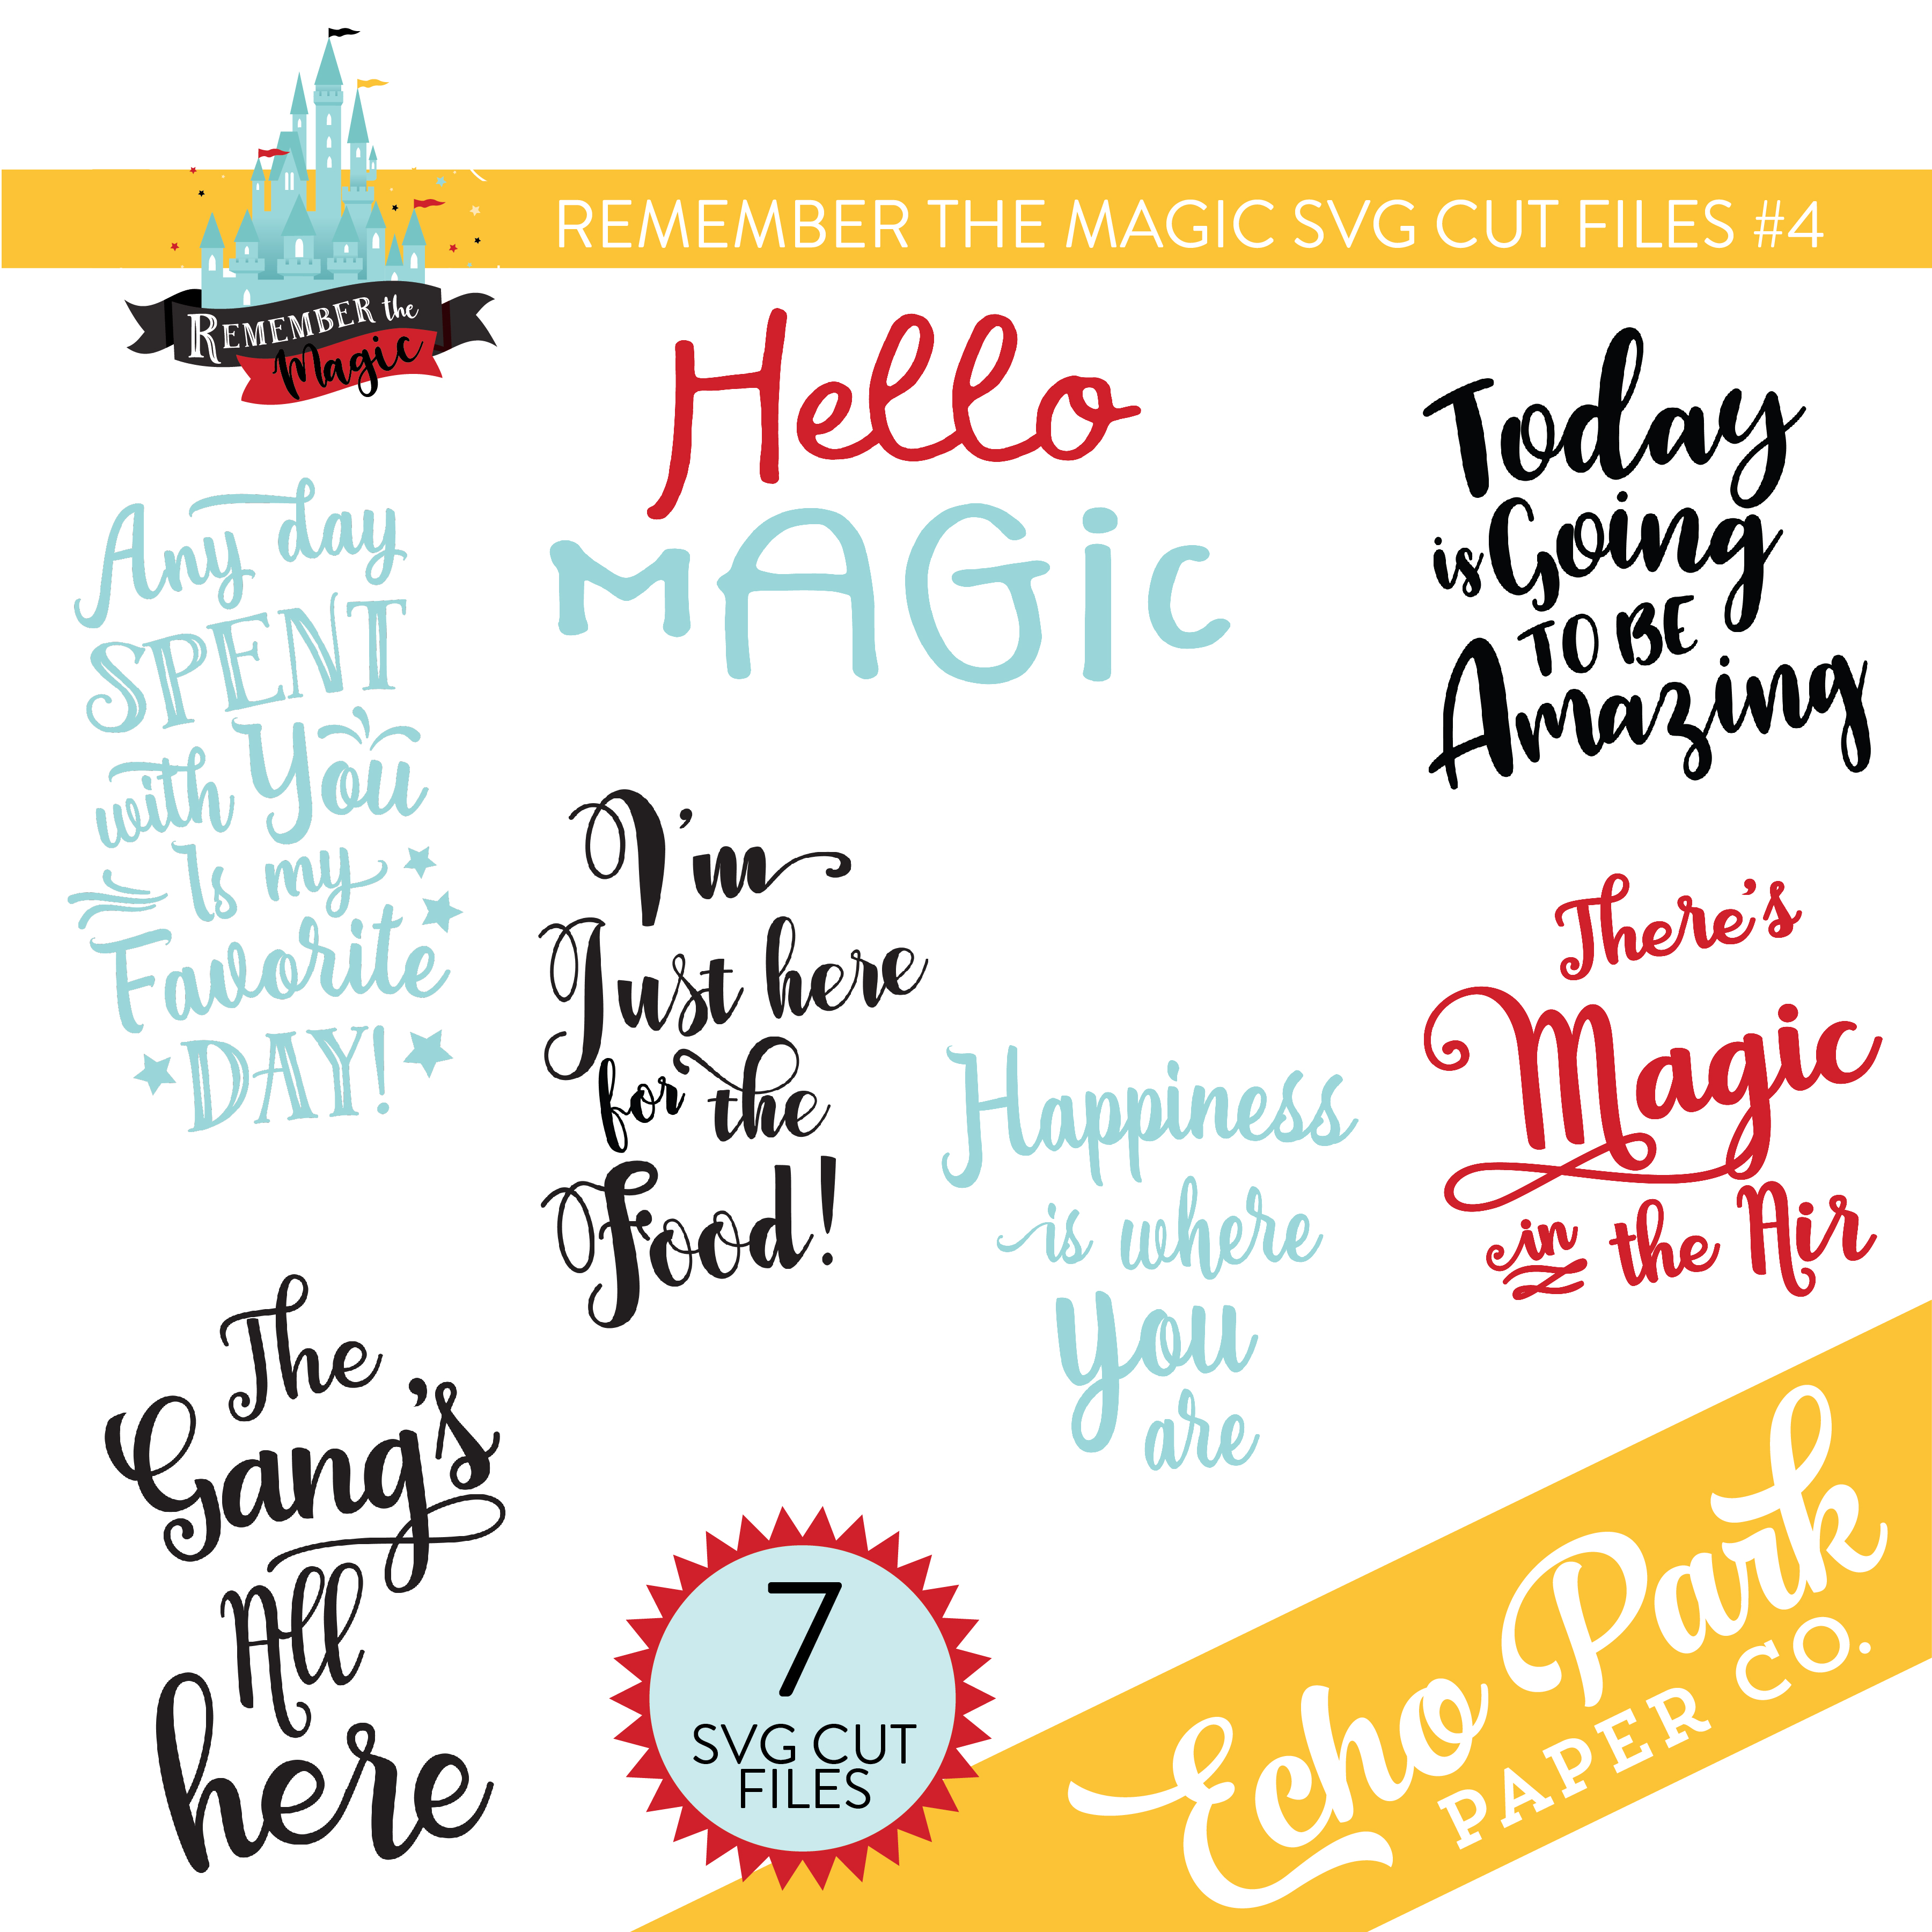 Remember The Magic SVG Cut Files #4